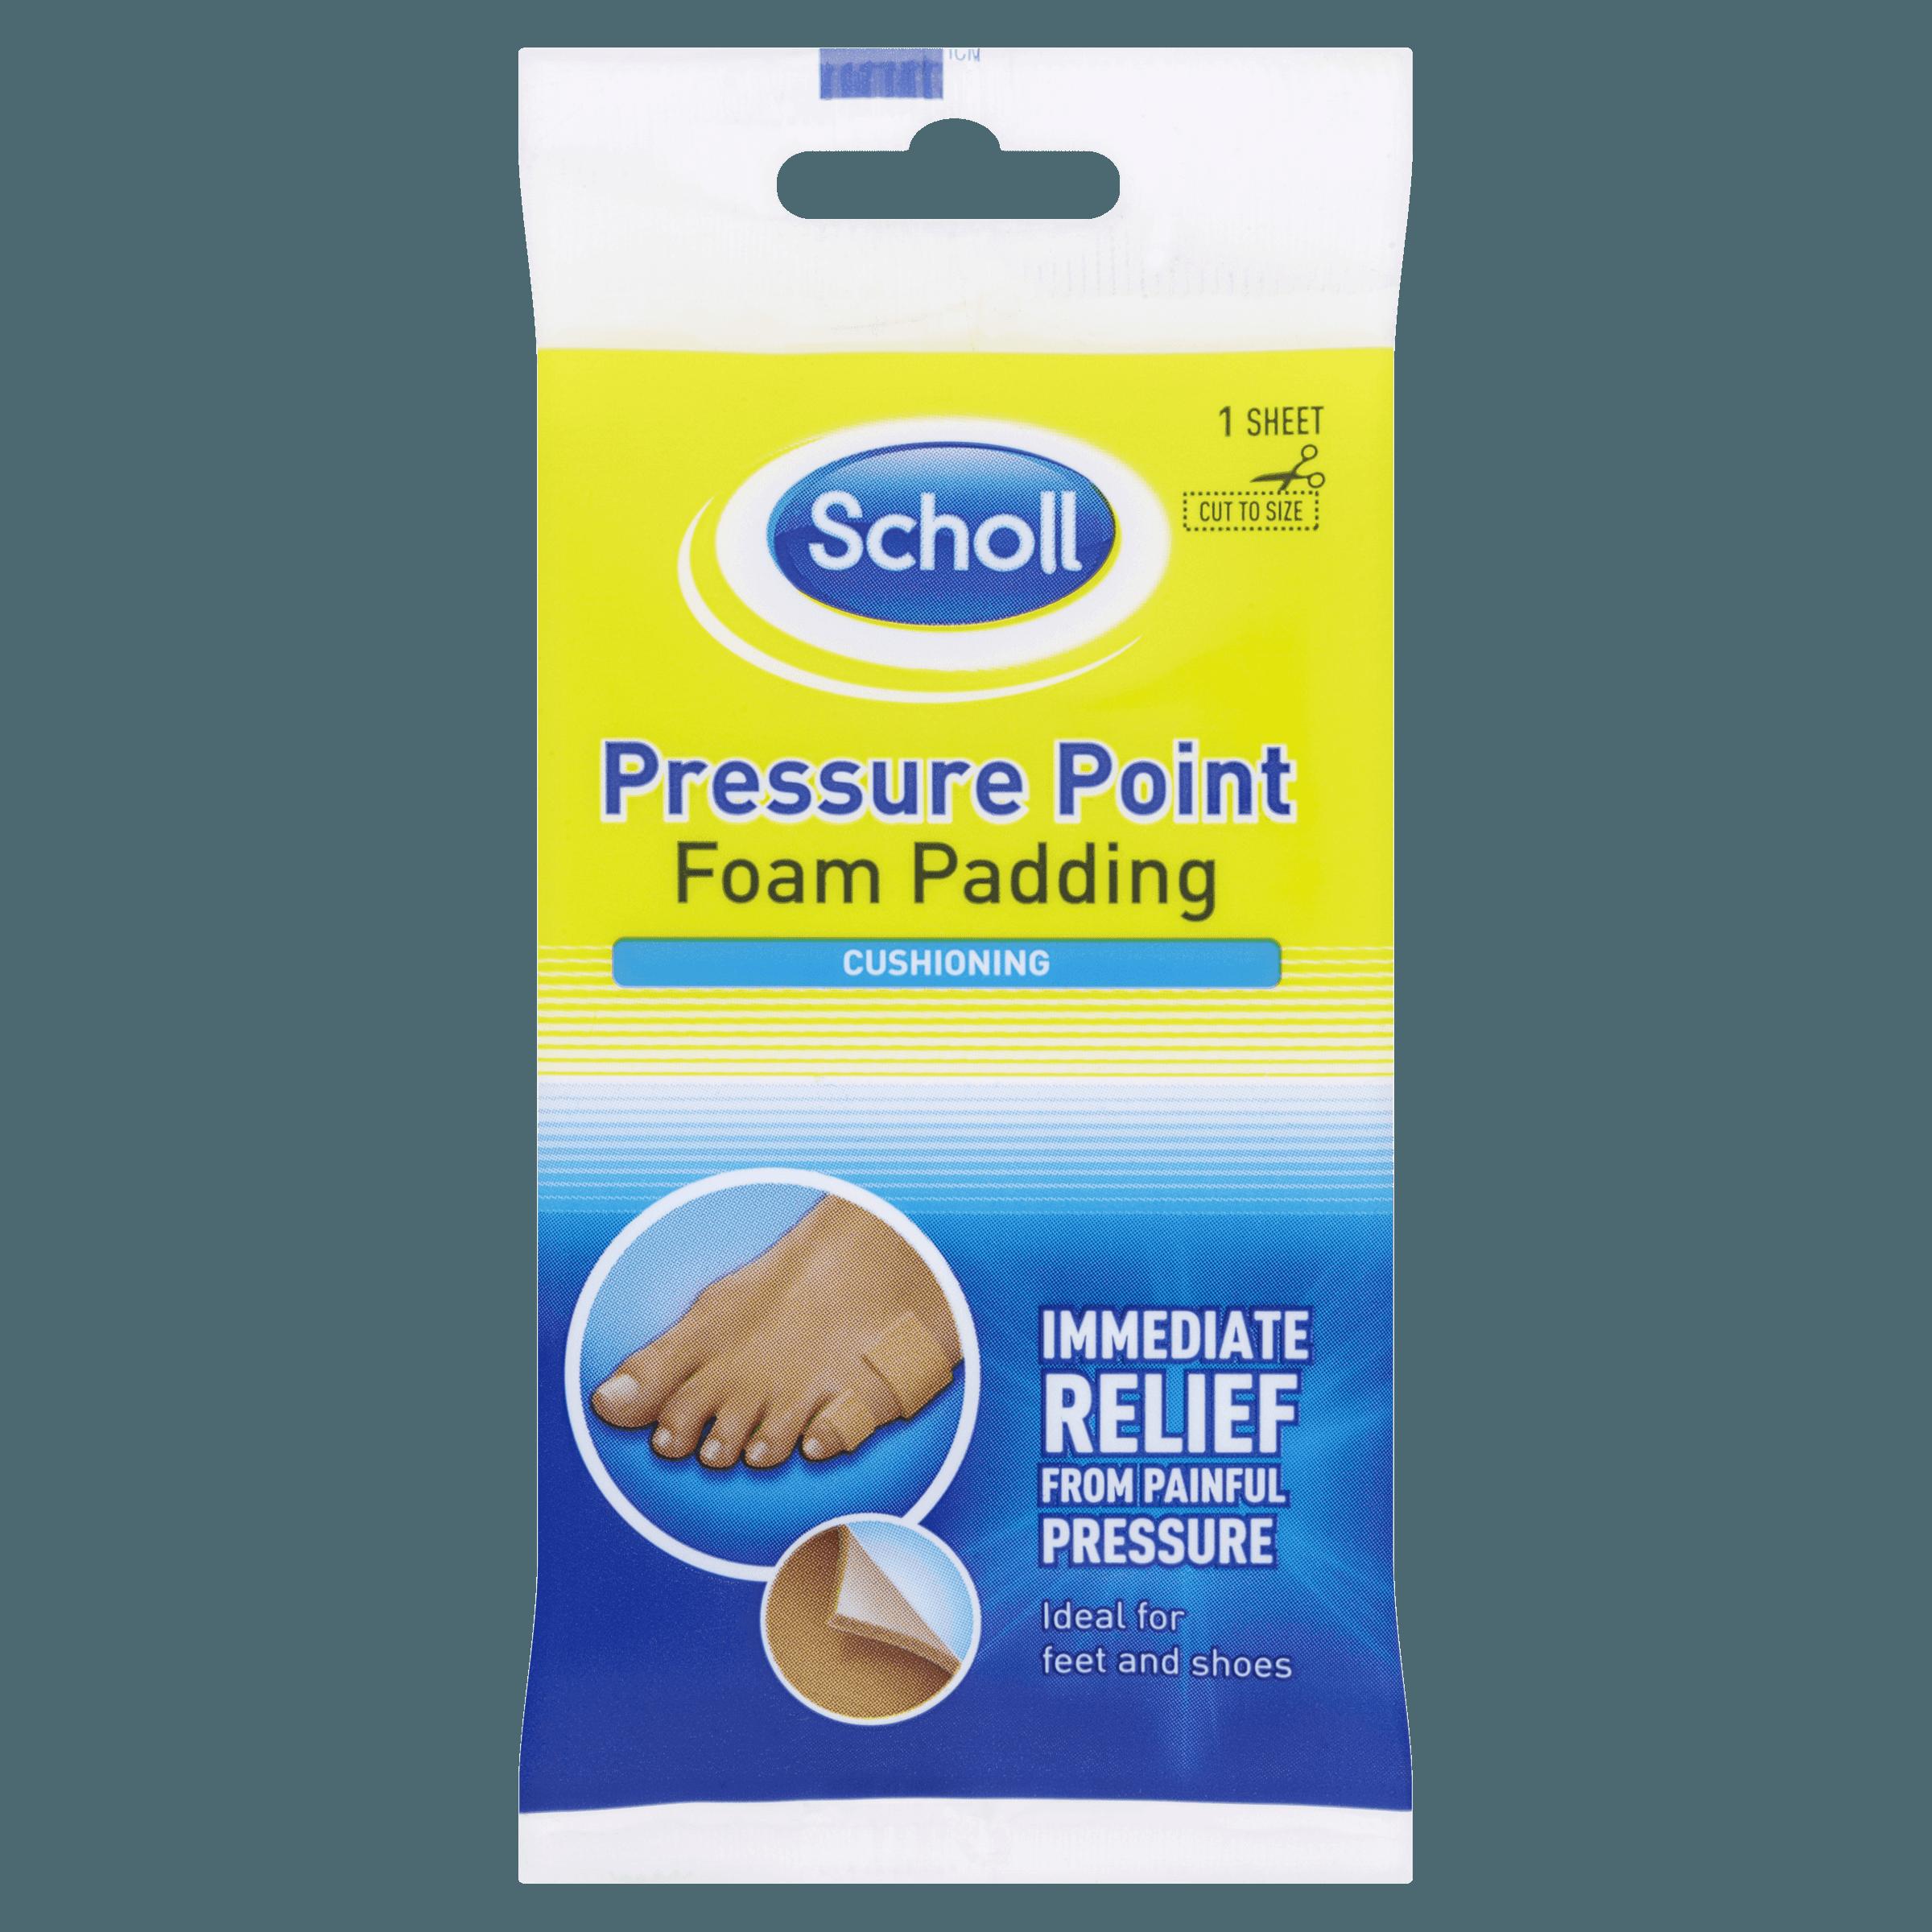 Pressure Point Foam Padding